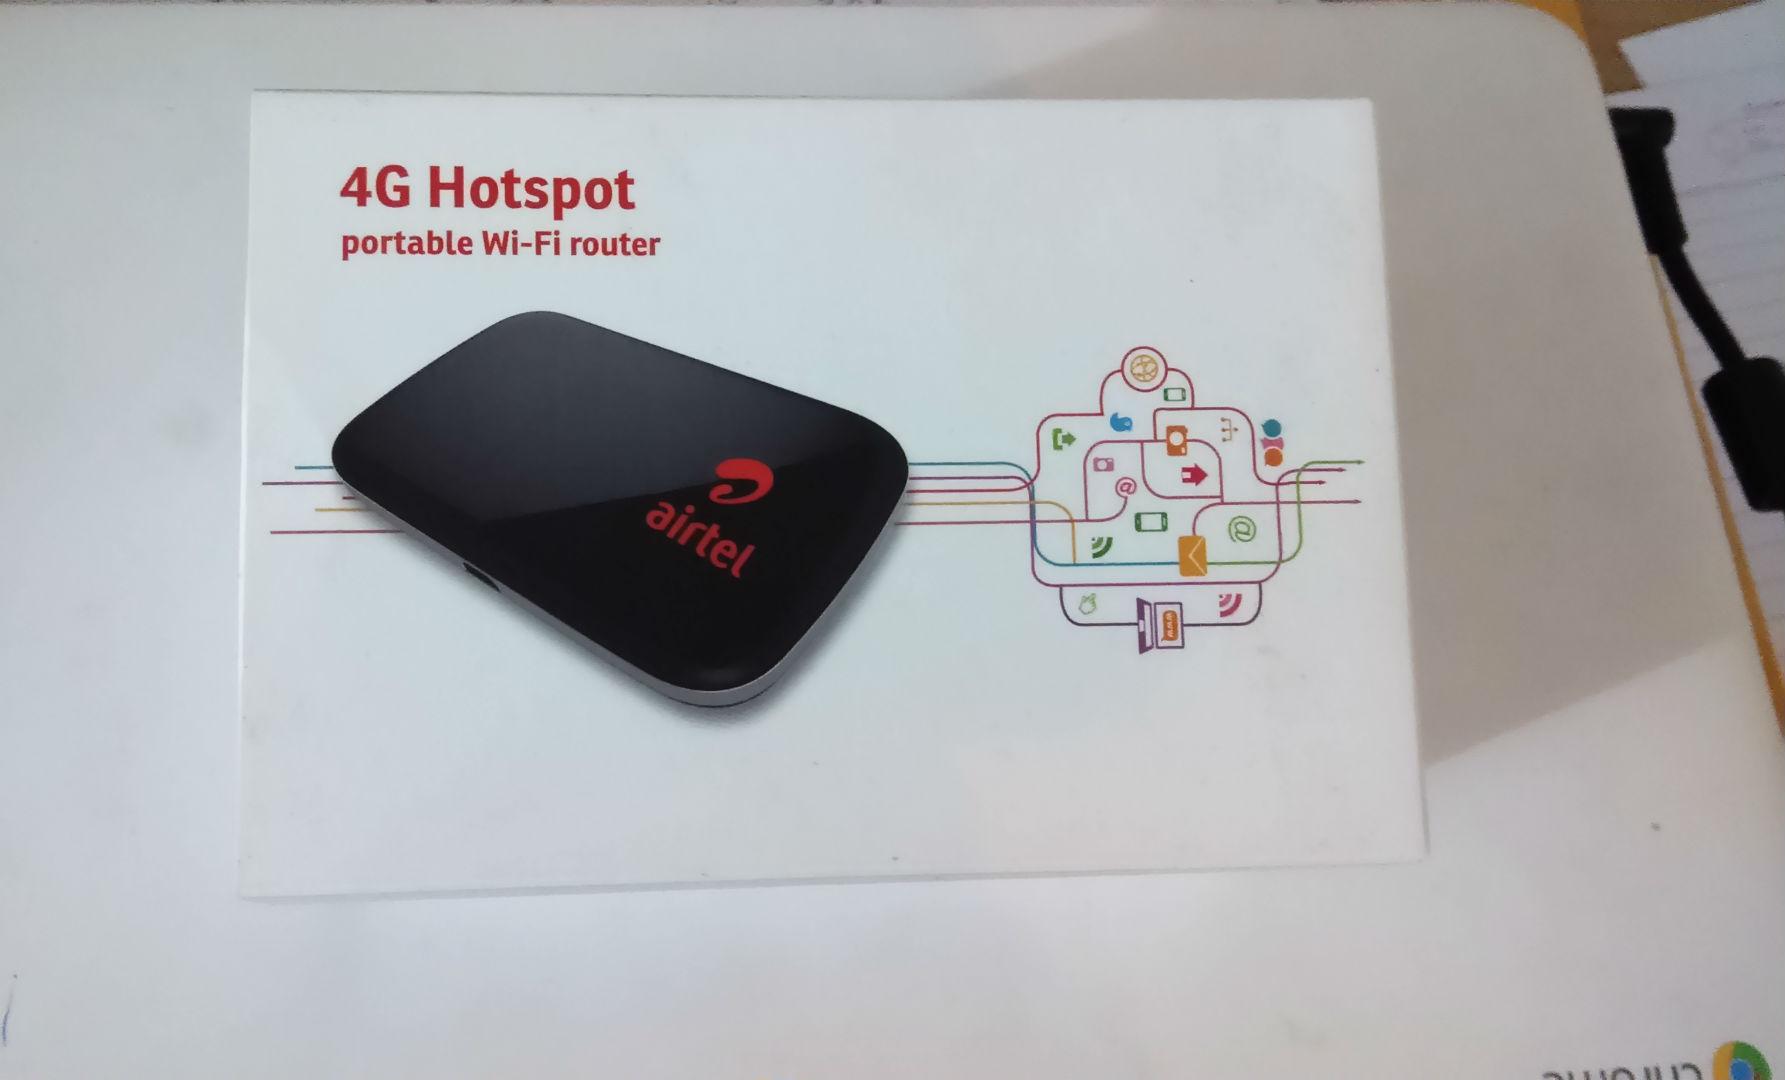 Airtel 4G router -The TeCake